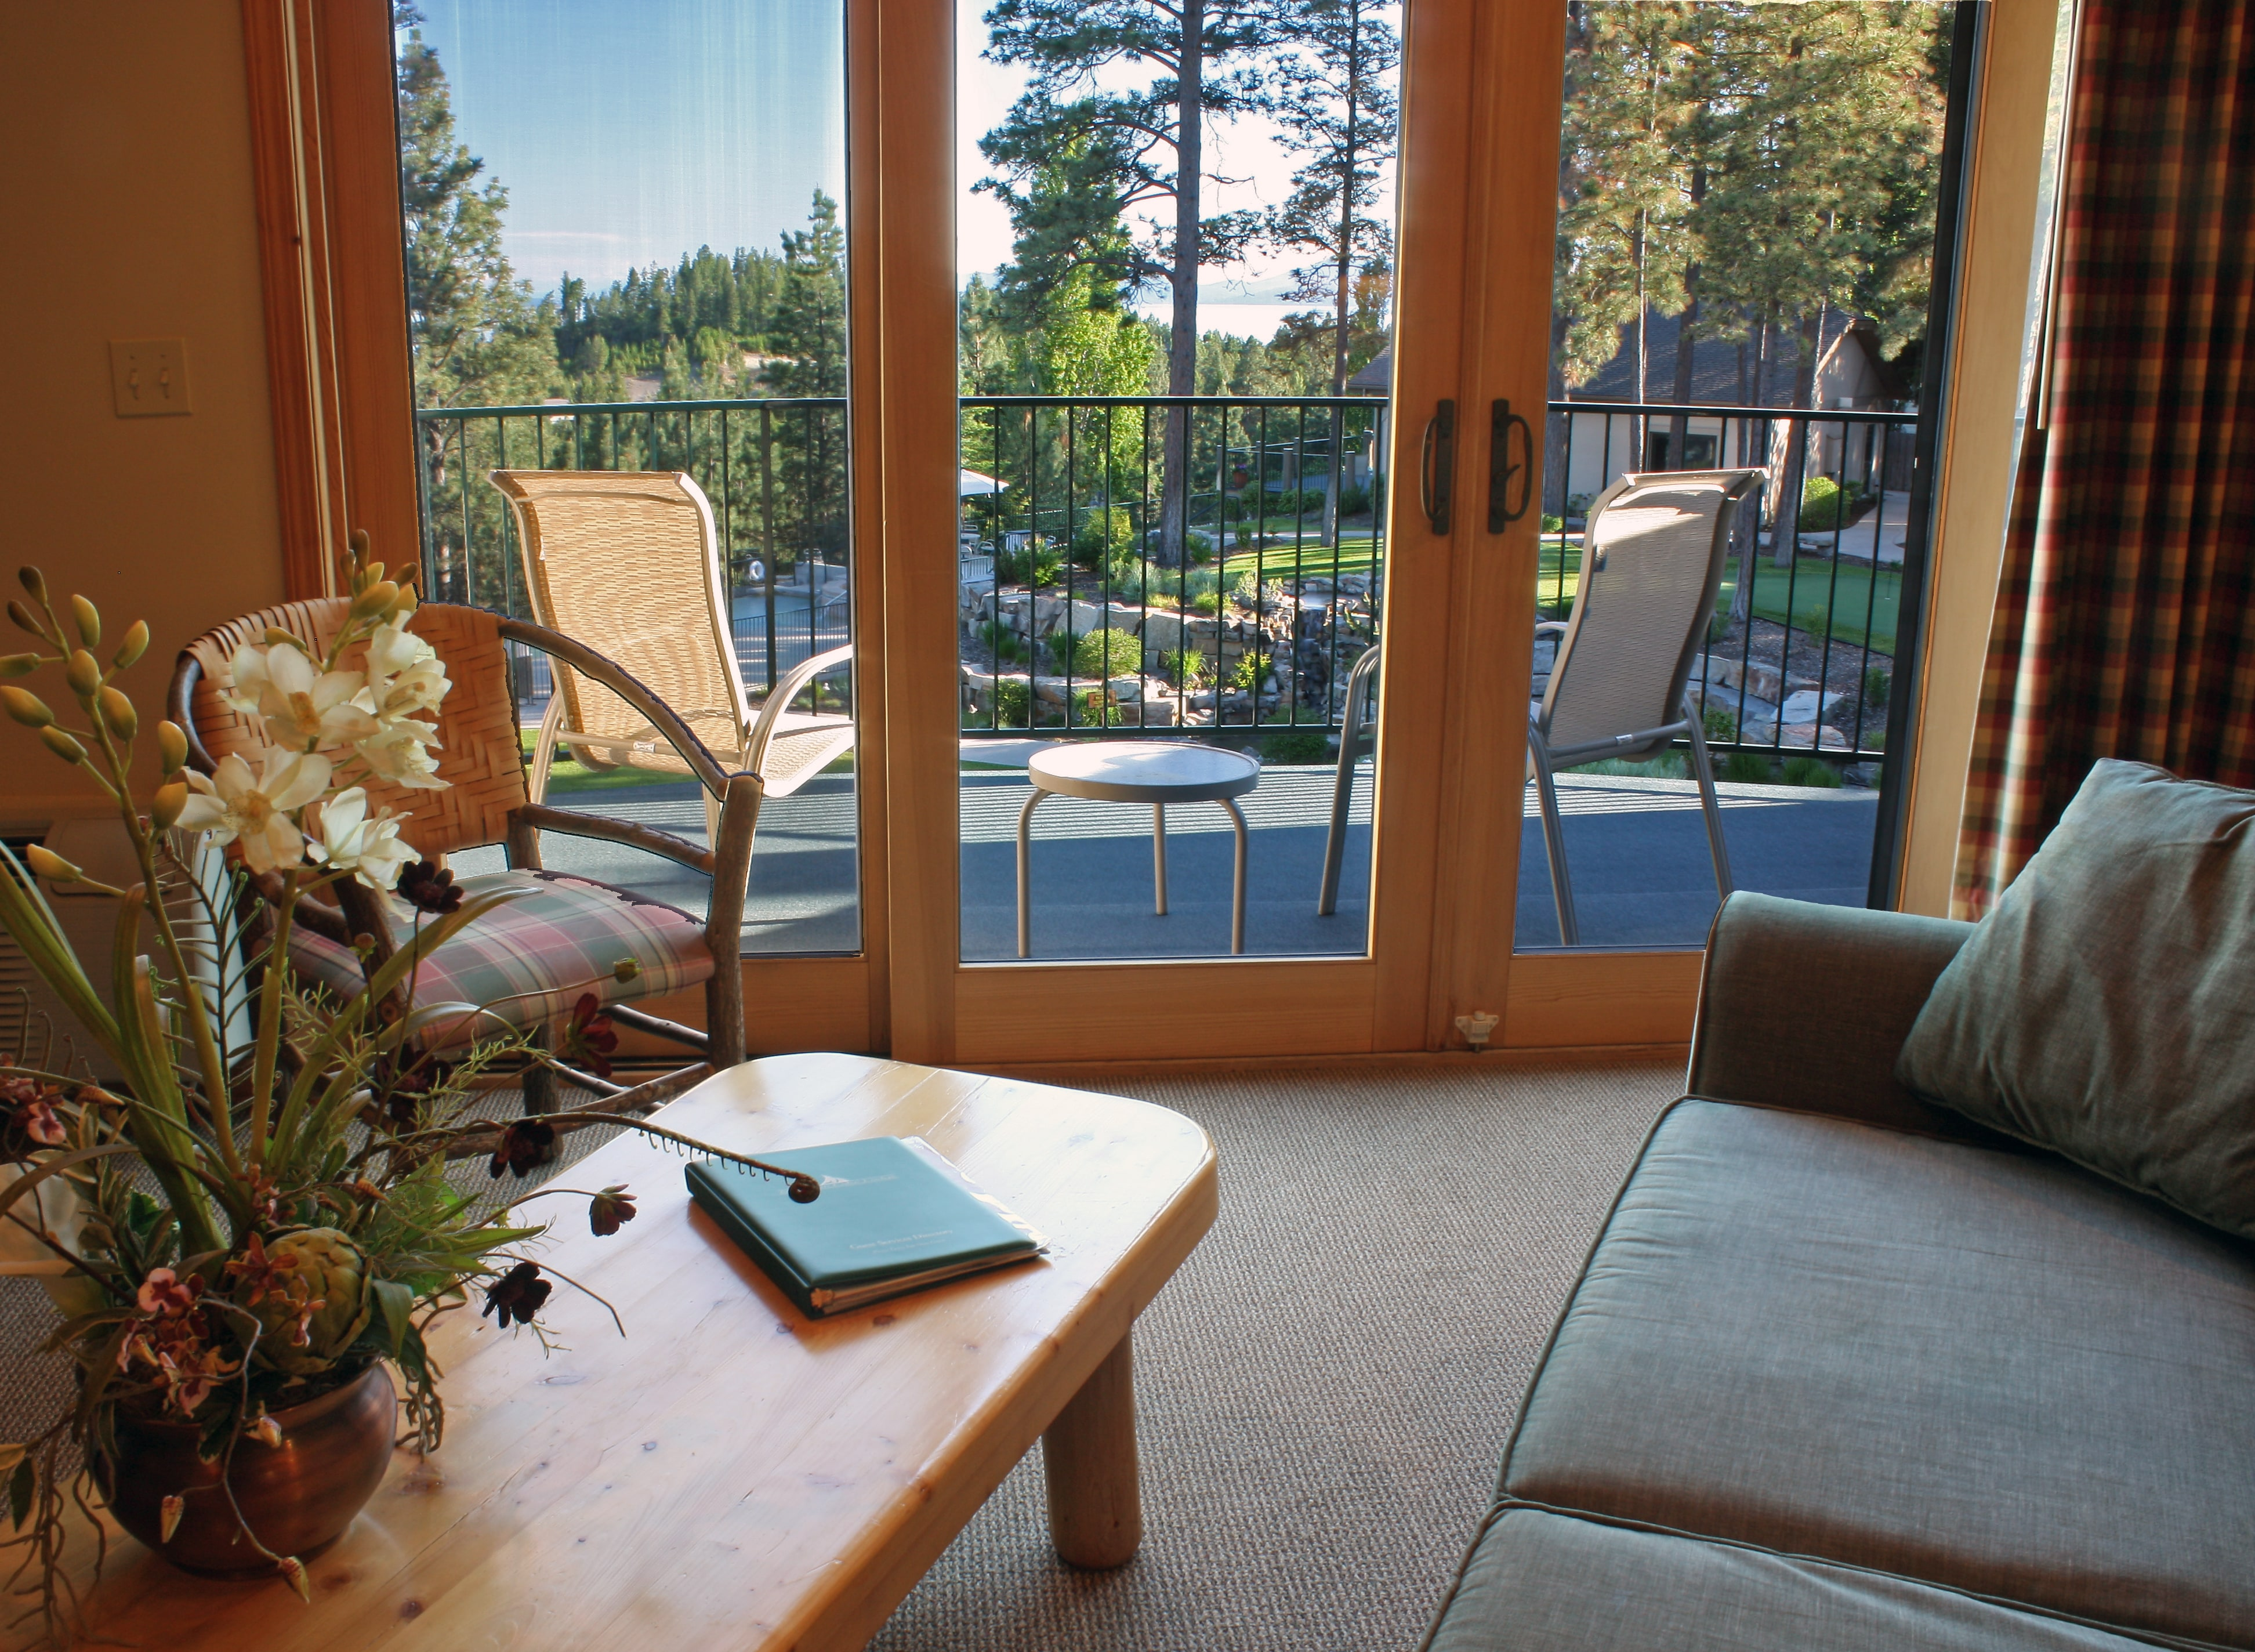 Mountain Lake Lodge - The Flathead Valley's Best Kept Secret